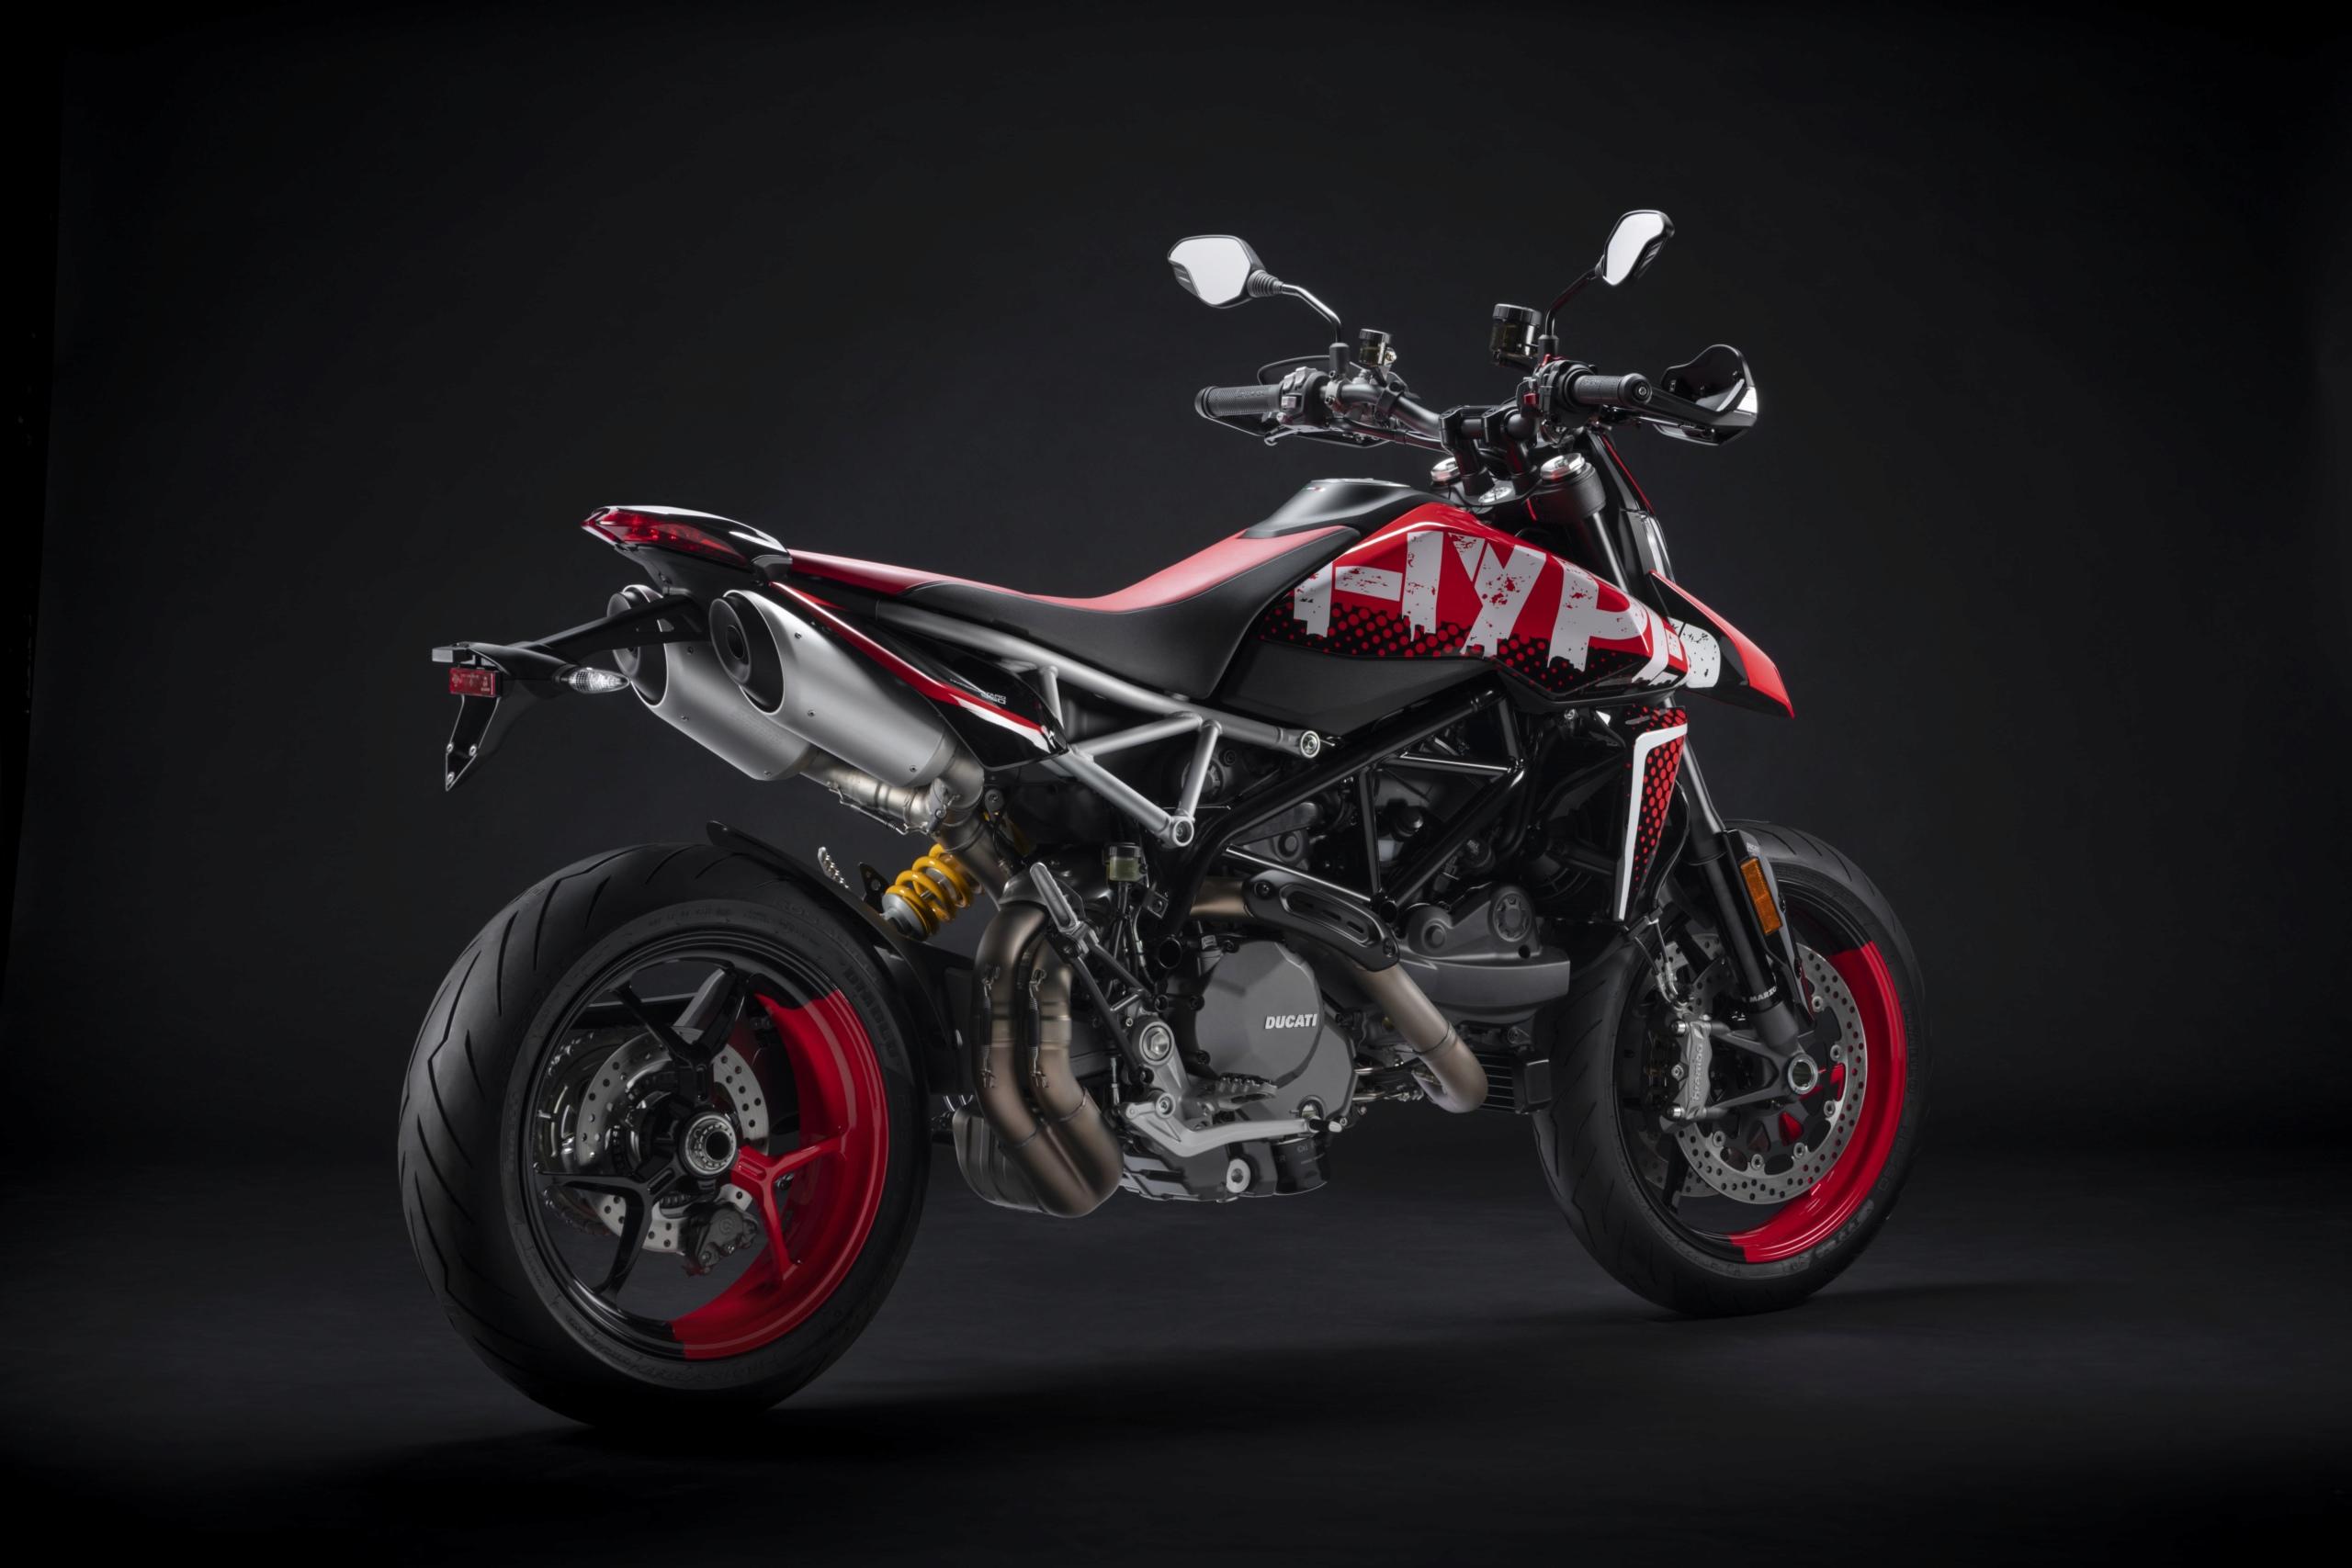 Ducati Hypermotard 950 RVE  05_duc10